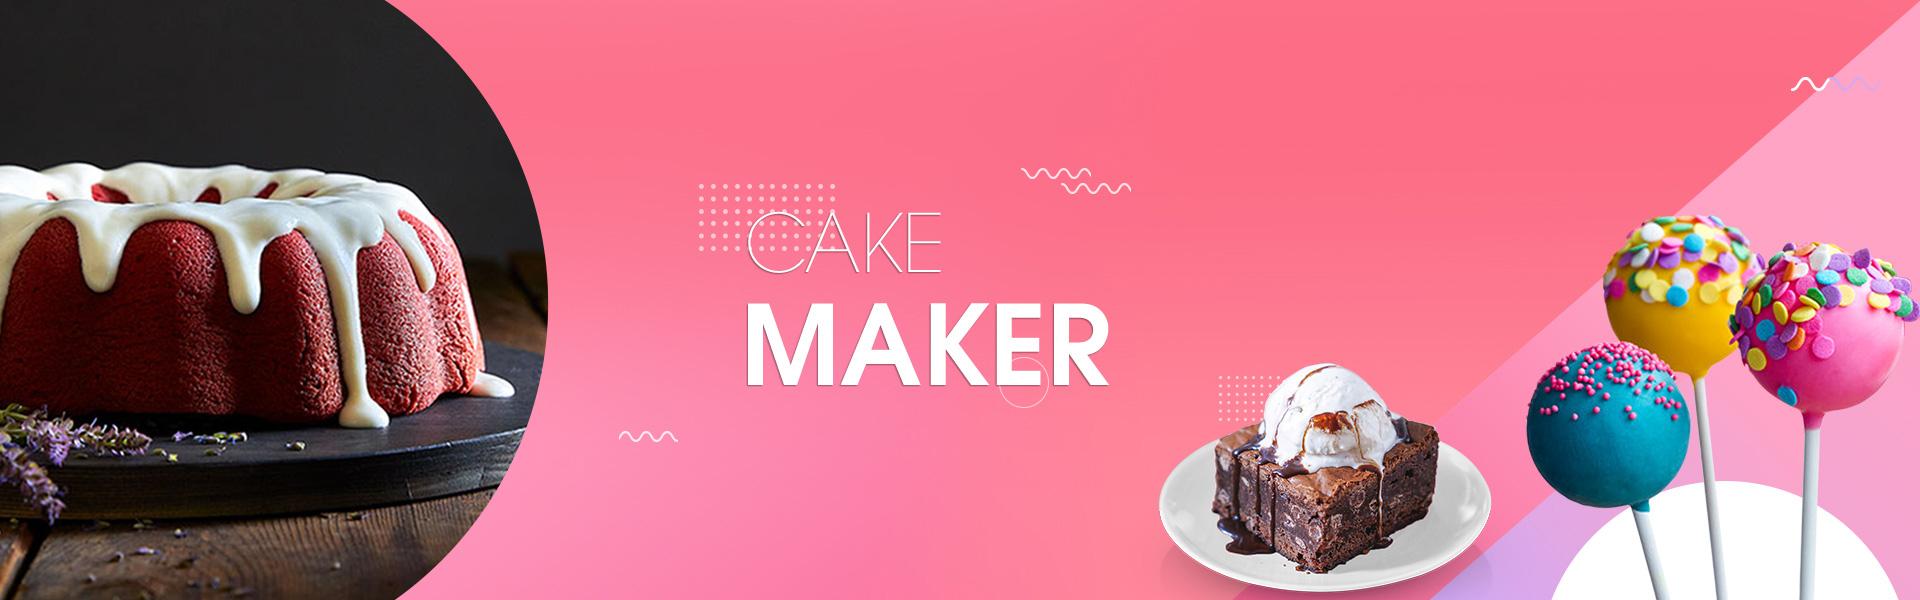 Cake-maker_1920x600